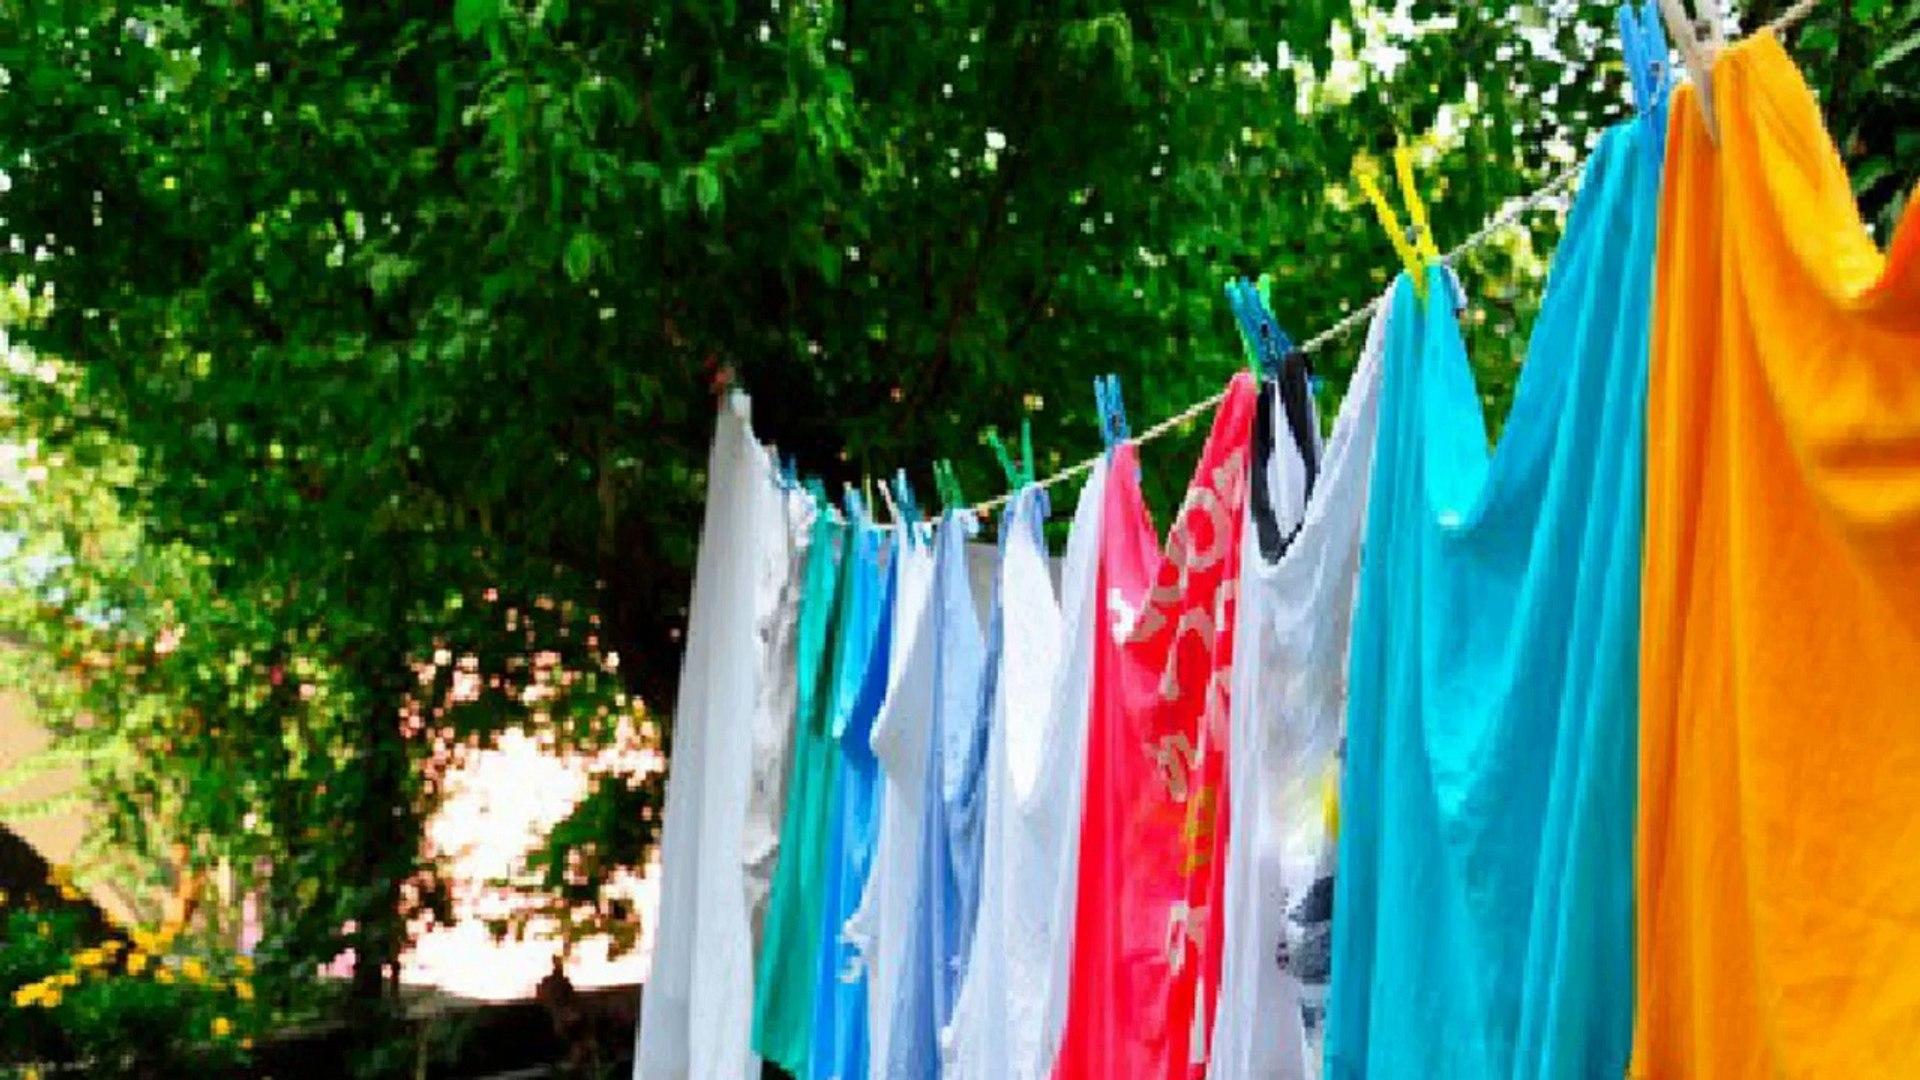 surf excel world of washing machines